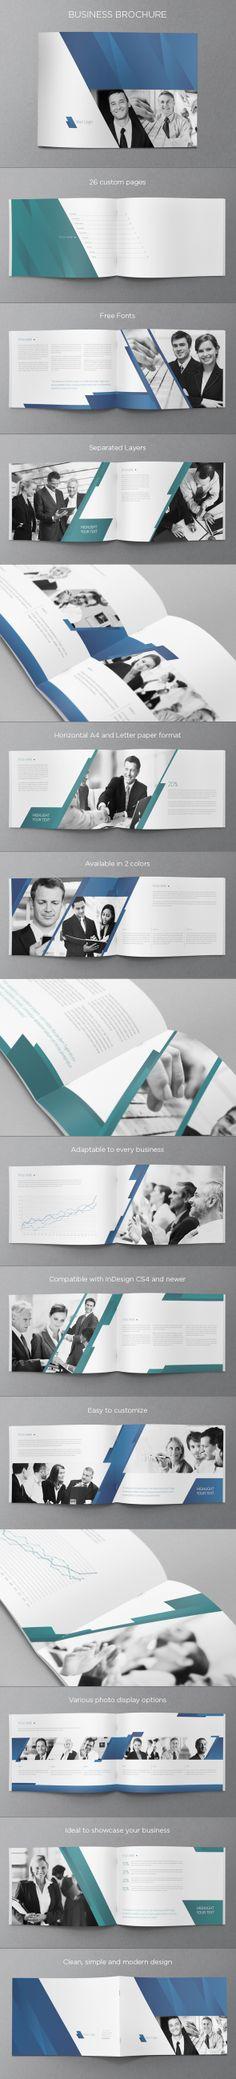 Business Brochure. Download here: http://graphicriver.net/item/business-brochure/5209636?ref=abradesign #design #brochure